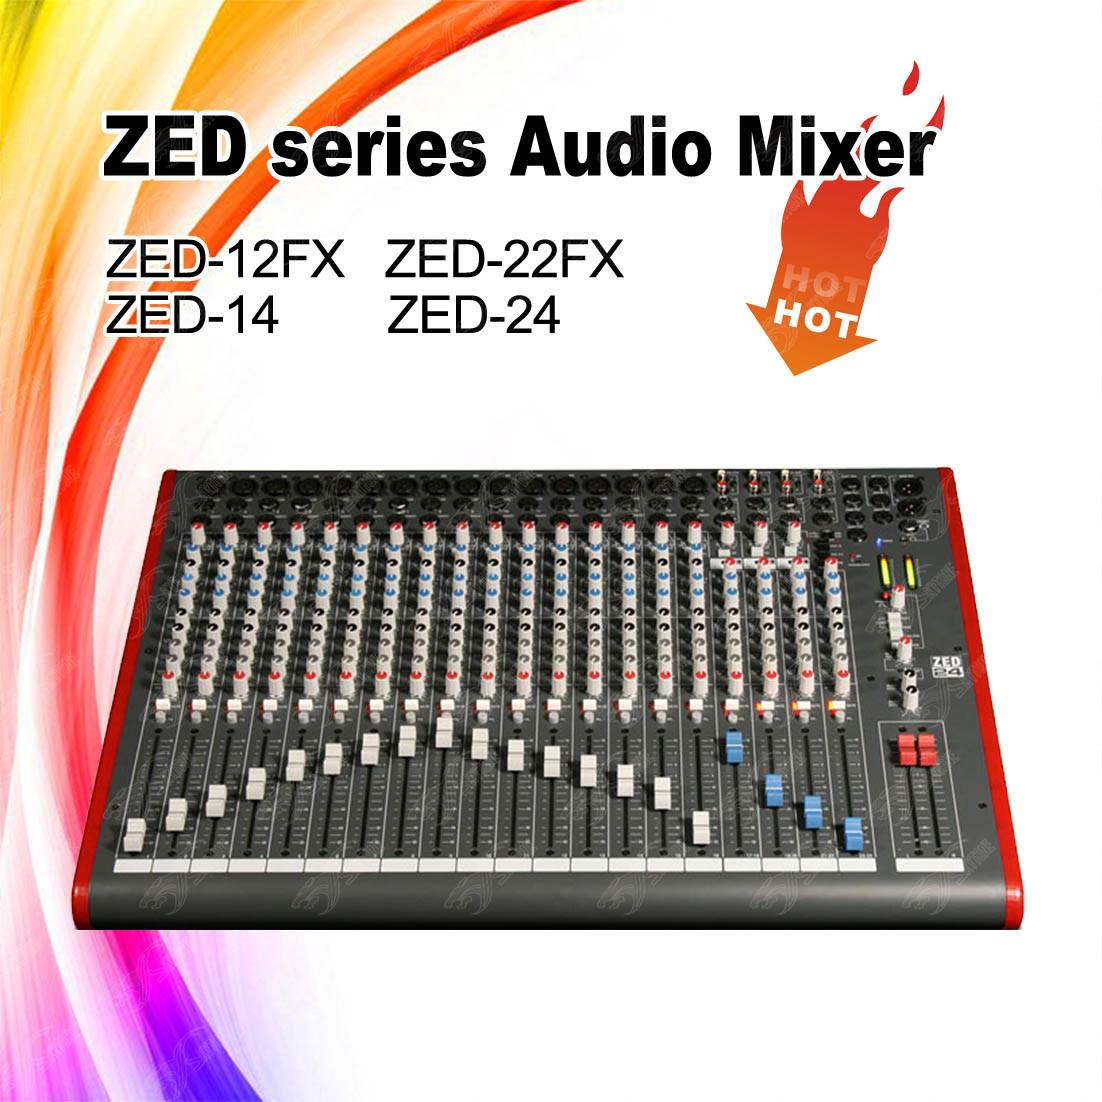 Wholesale Professional Sound Mixer Buy Reliable Channel Audio Circuit Zed 24 Cheap Price Channels Dj